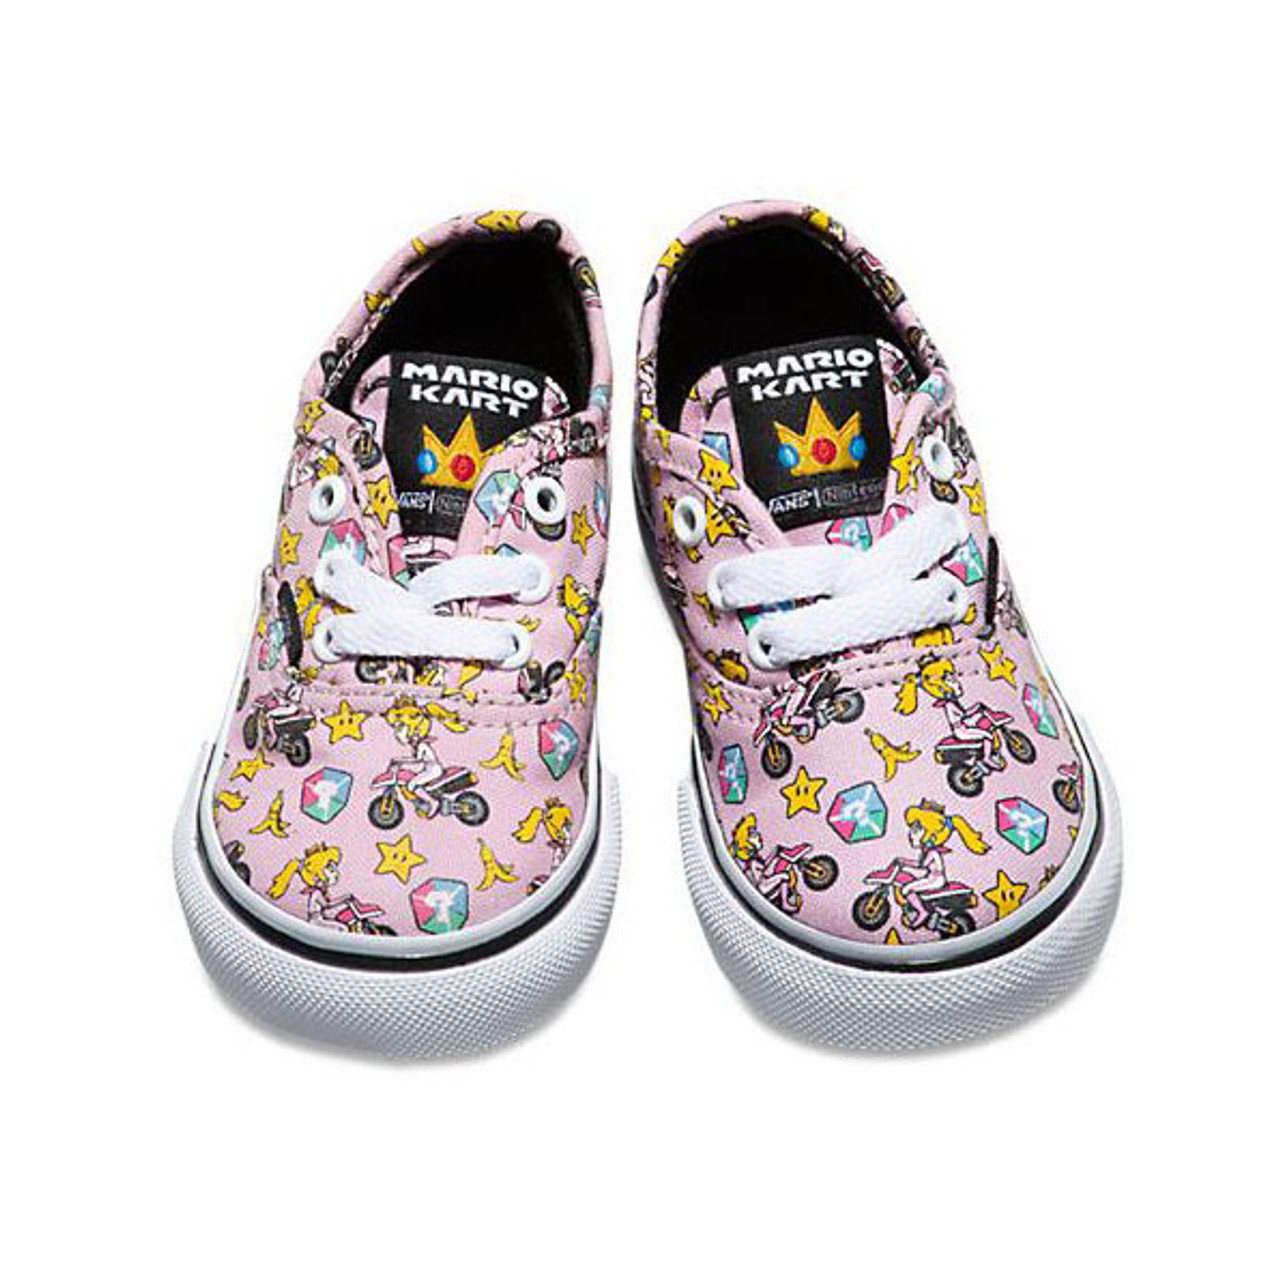 7b9bcf3f5e Vans Nintendo Collaboration Princess Peach Motorcycle Authentic Shoes